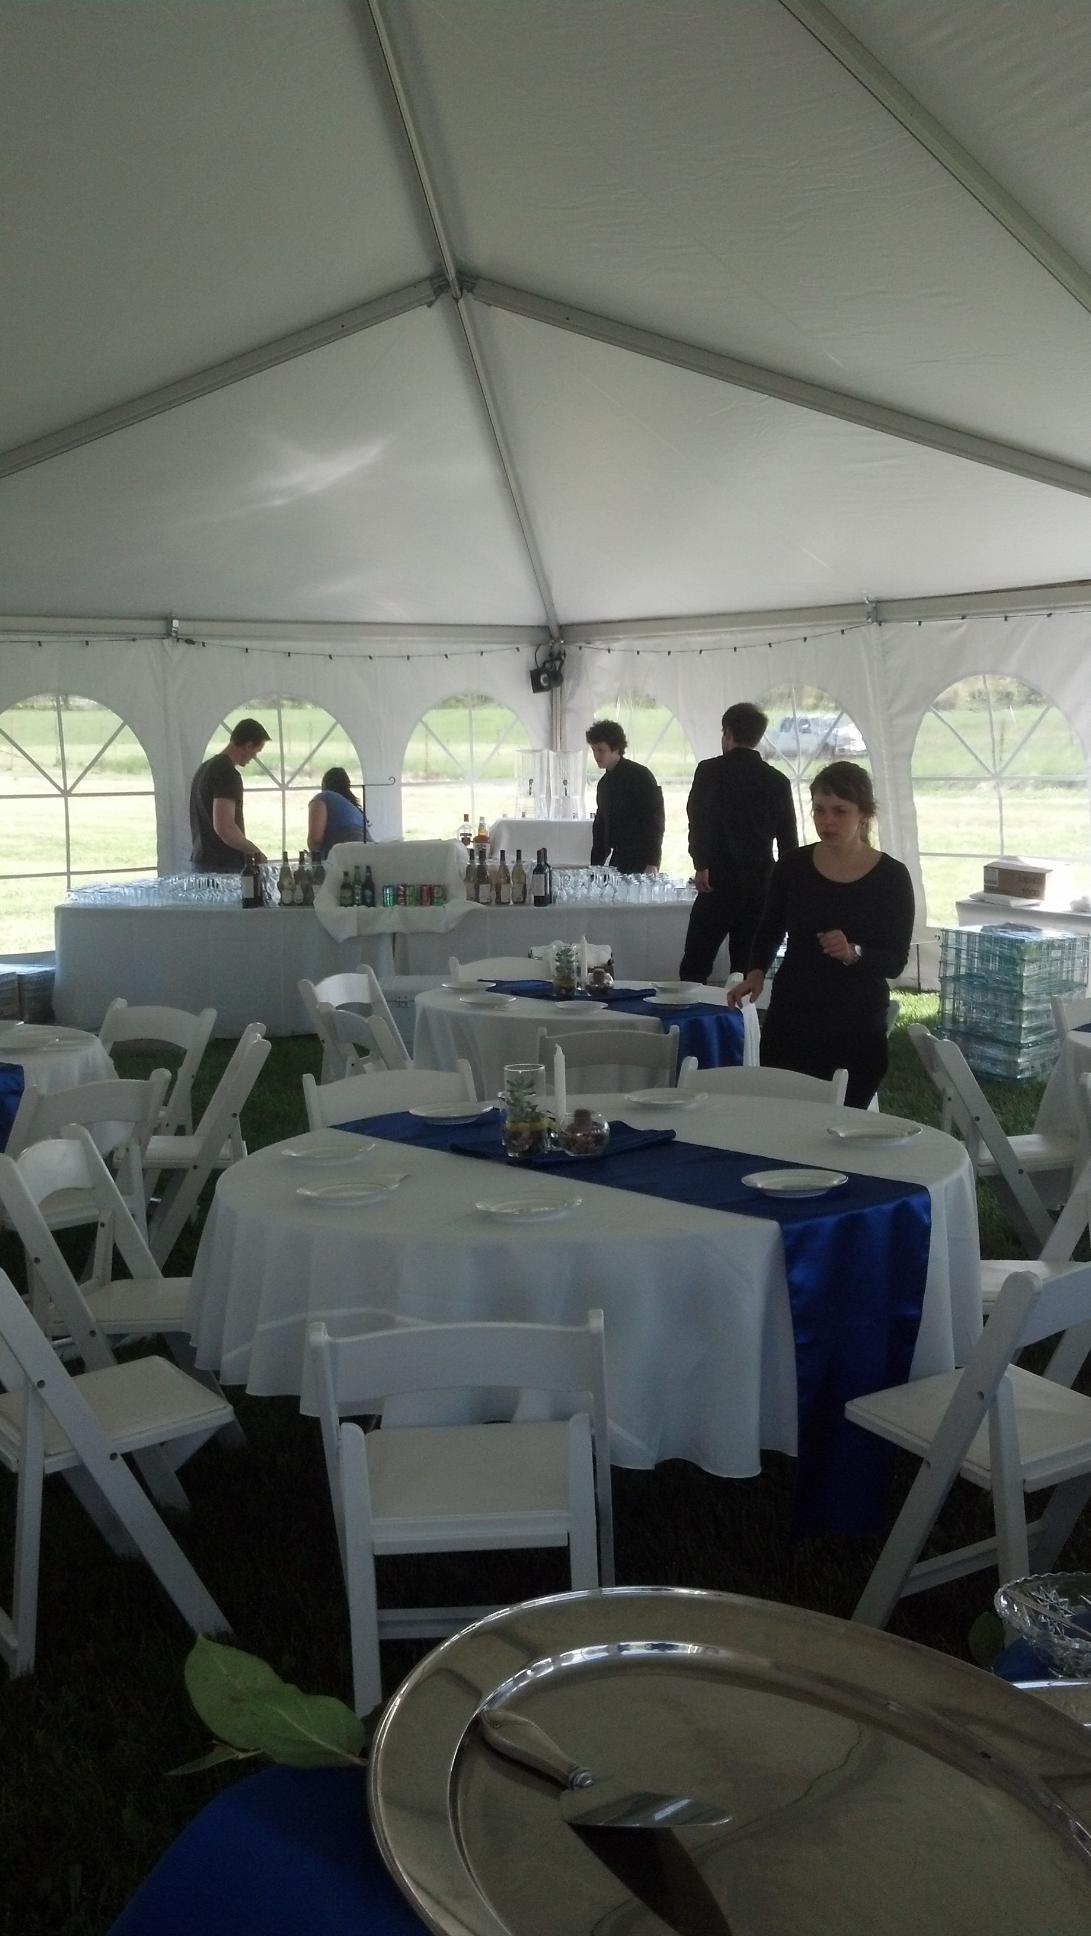 Eloquent rentals for your tent wedding